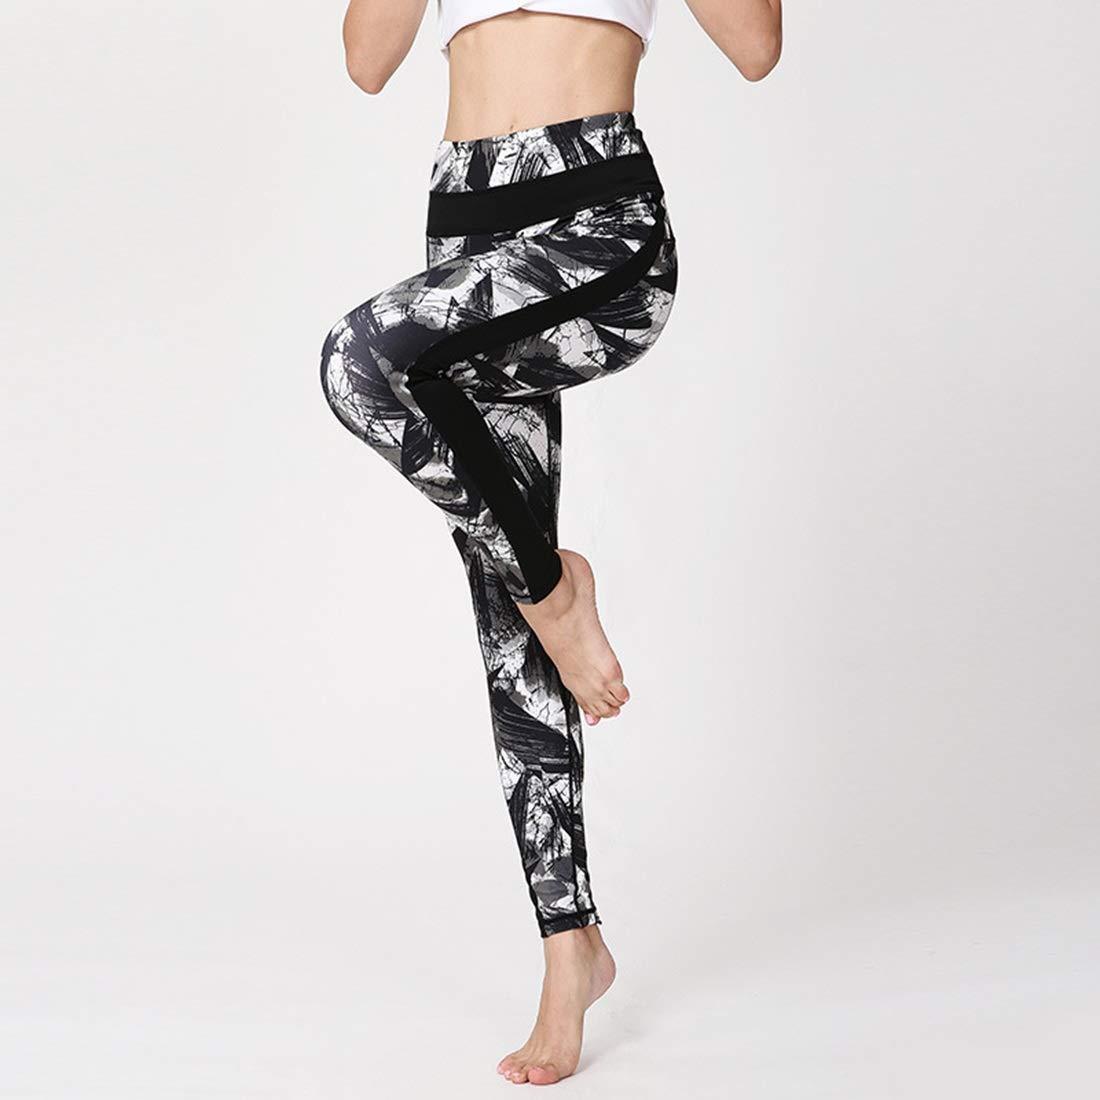 HONGHUIKE Pantalones de Yoga Pantalones de chándal Impresión ...